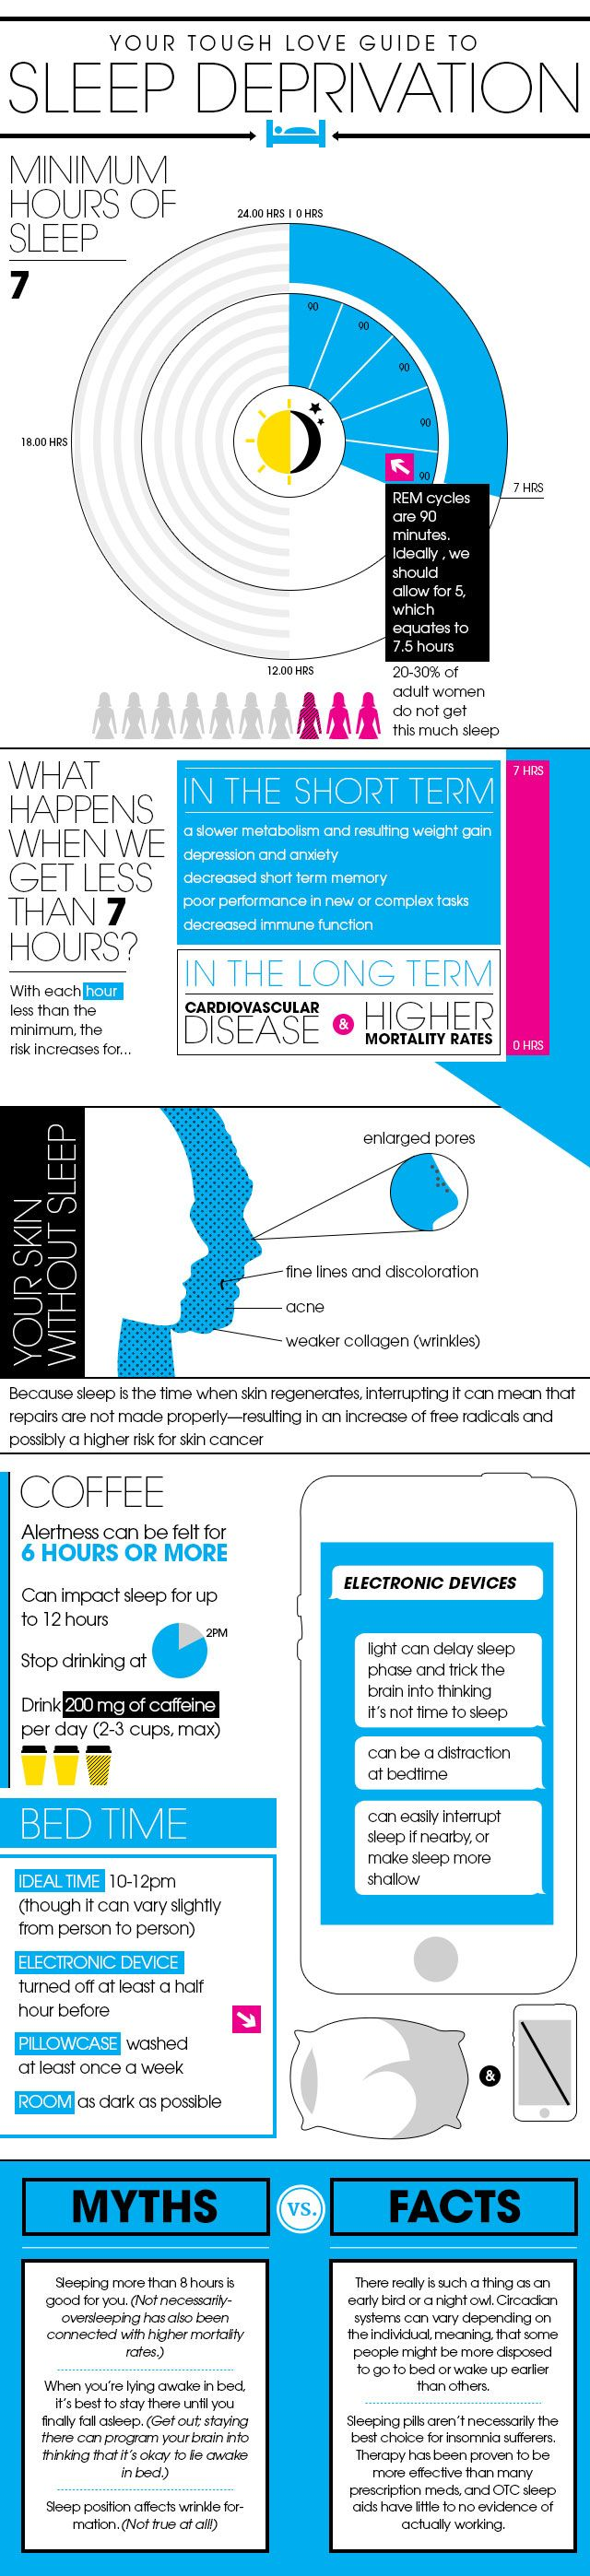 Sleep Deprivation by Alyssa Recht, elle.com #Infographic #Sleep_Deprivation.